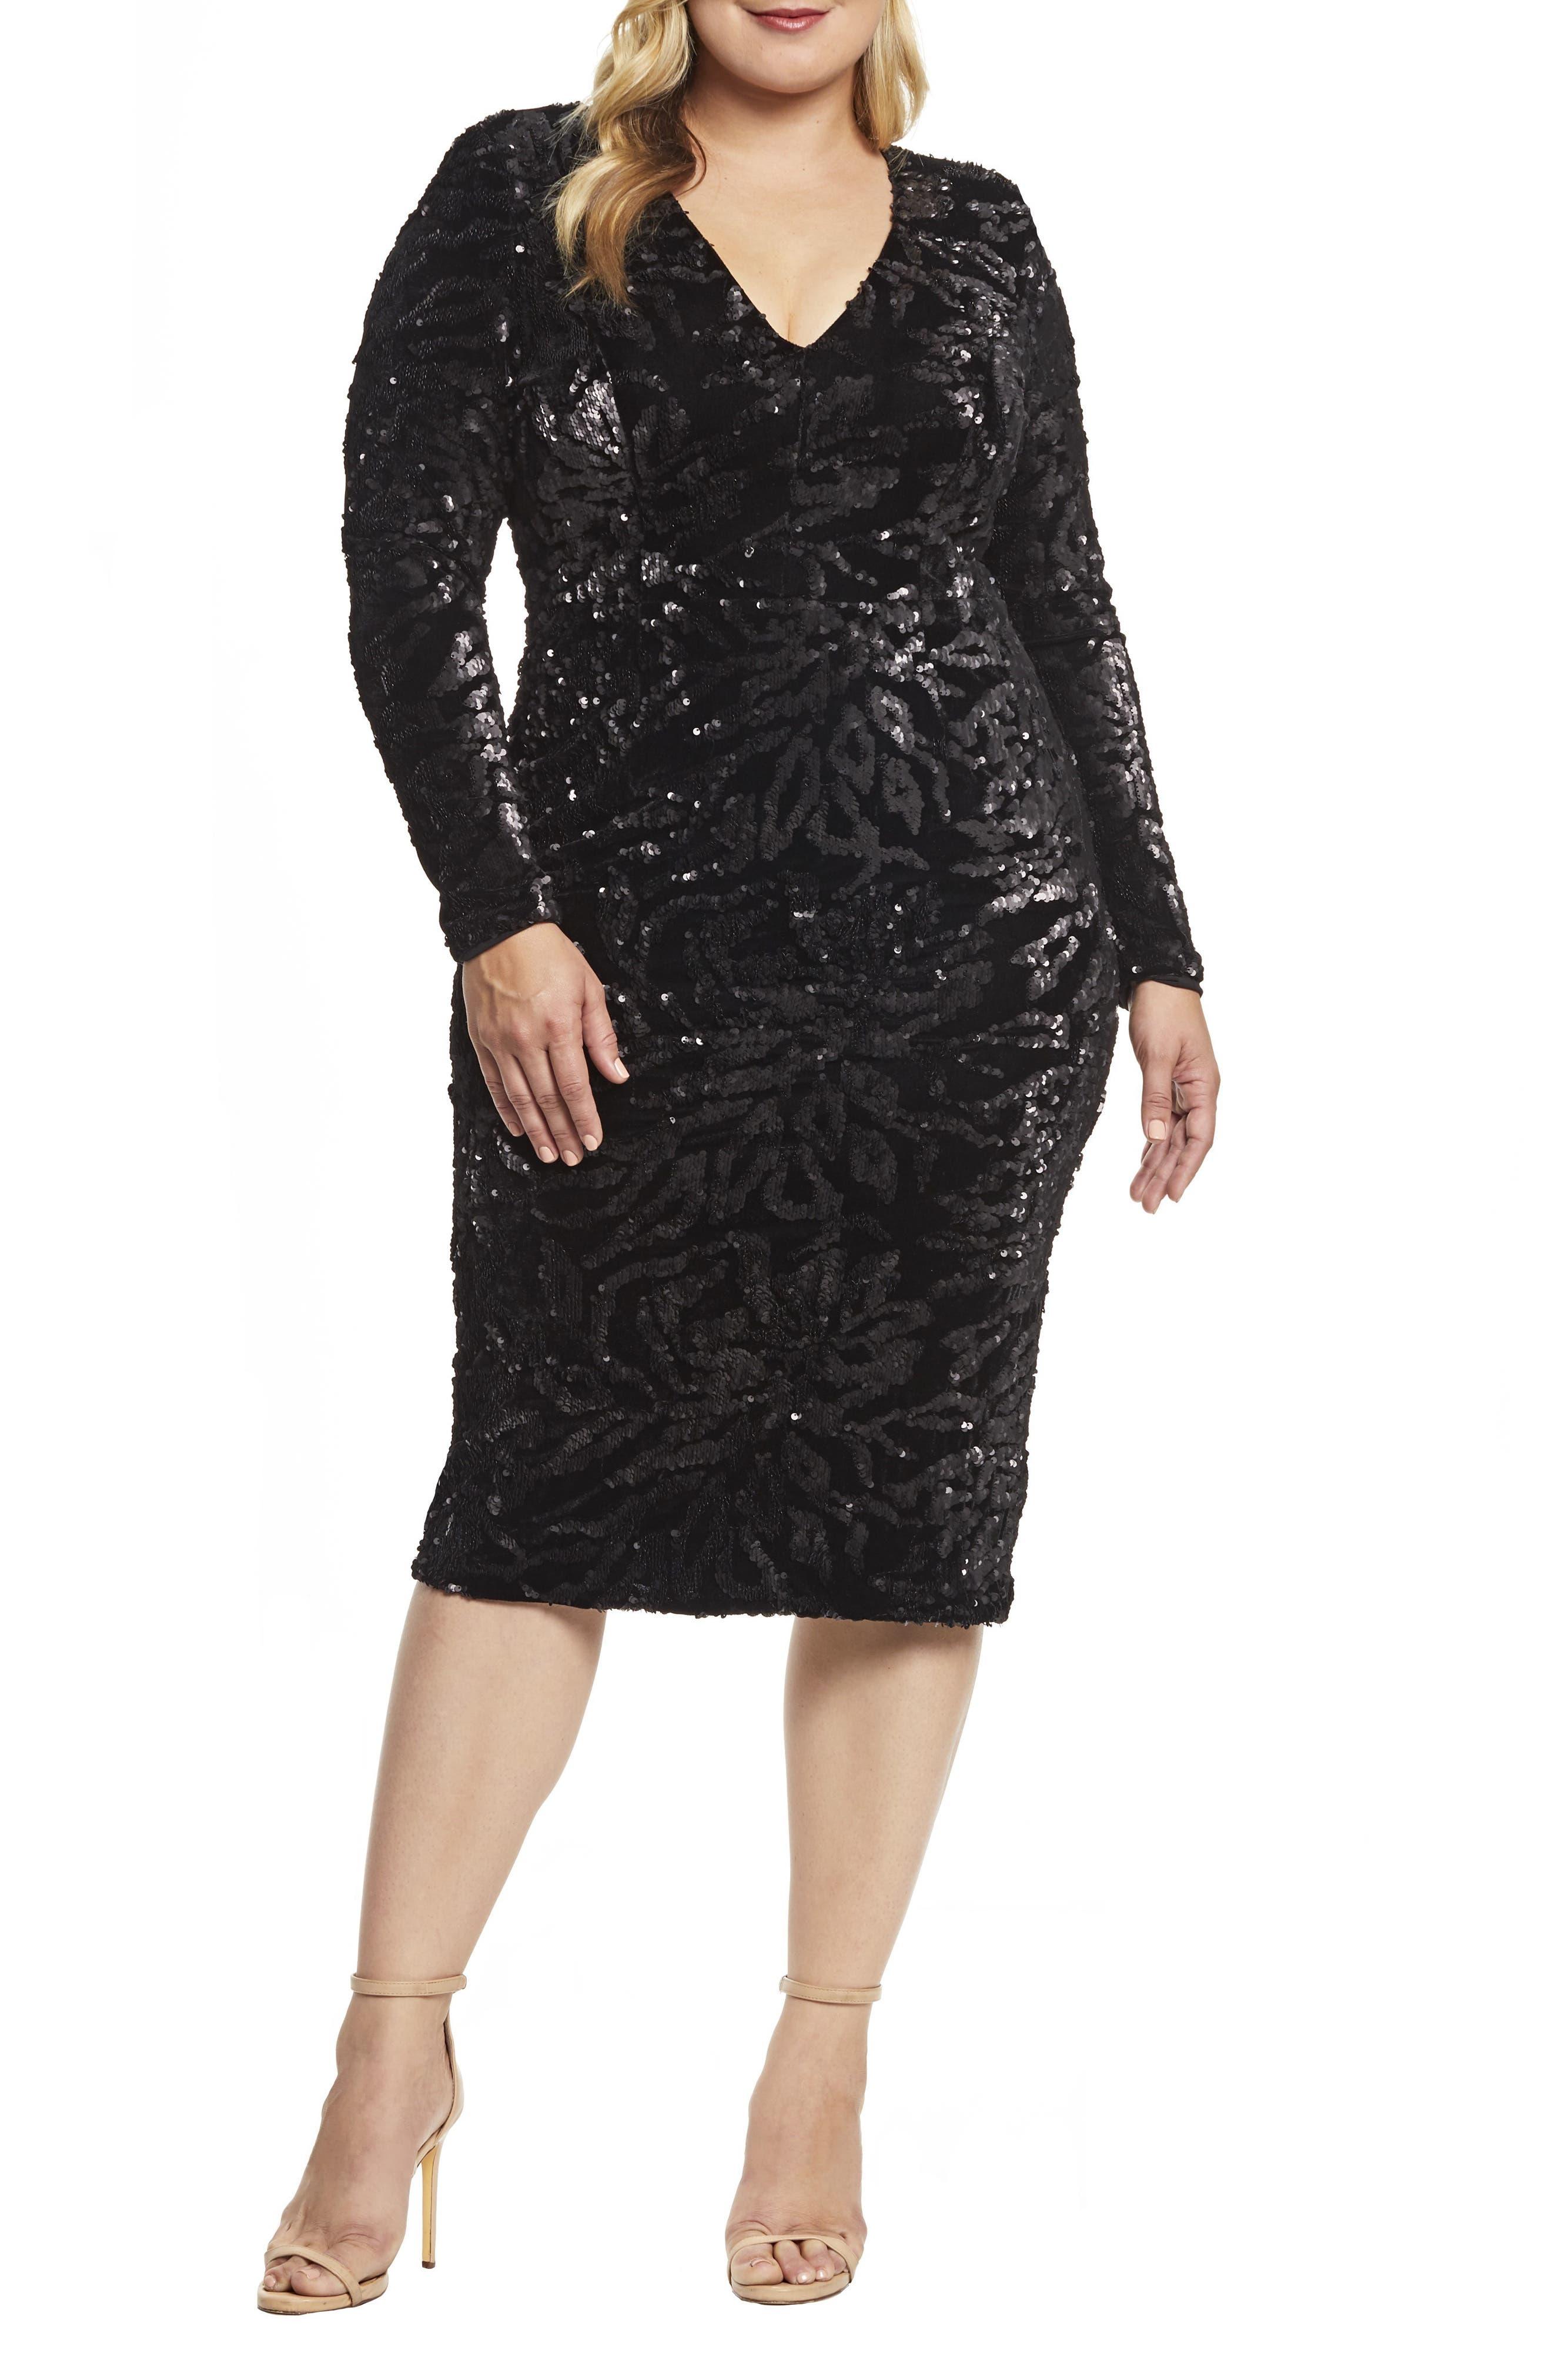 Midi Plus Size Black Cocktail Dresses